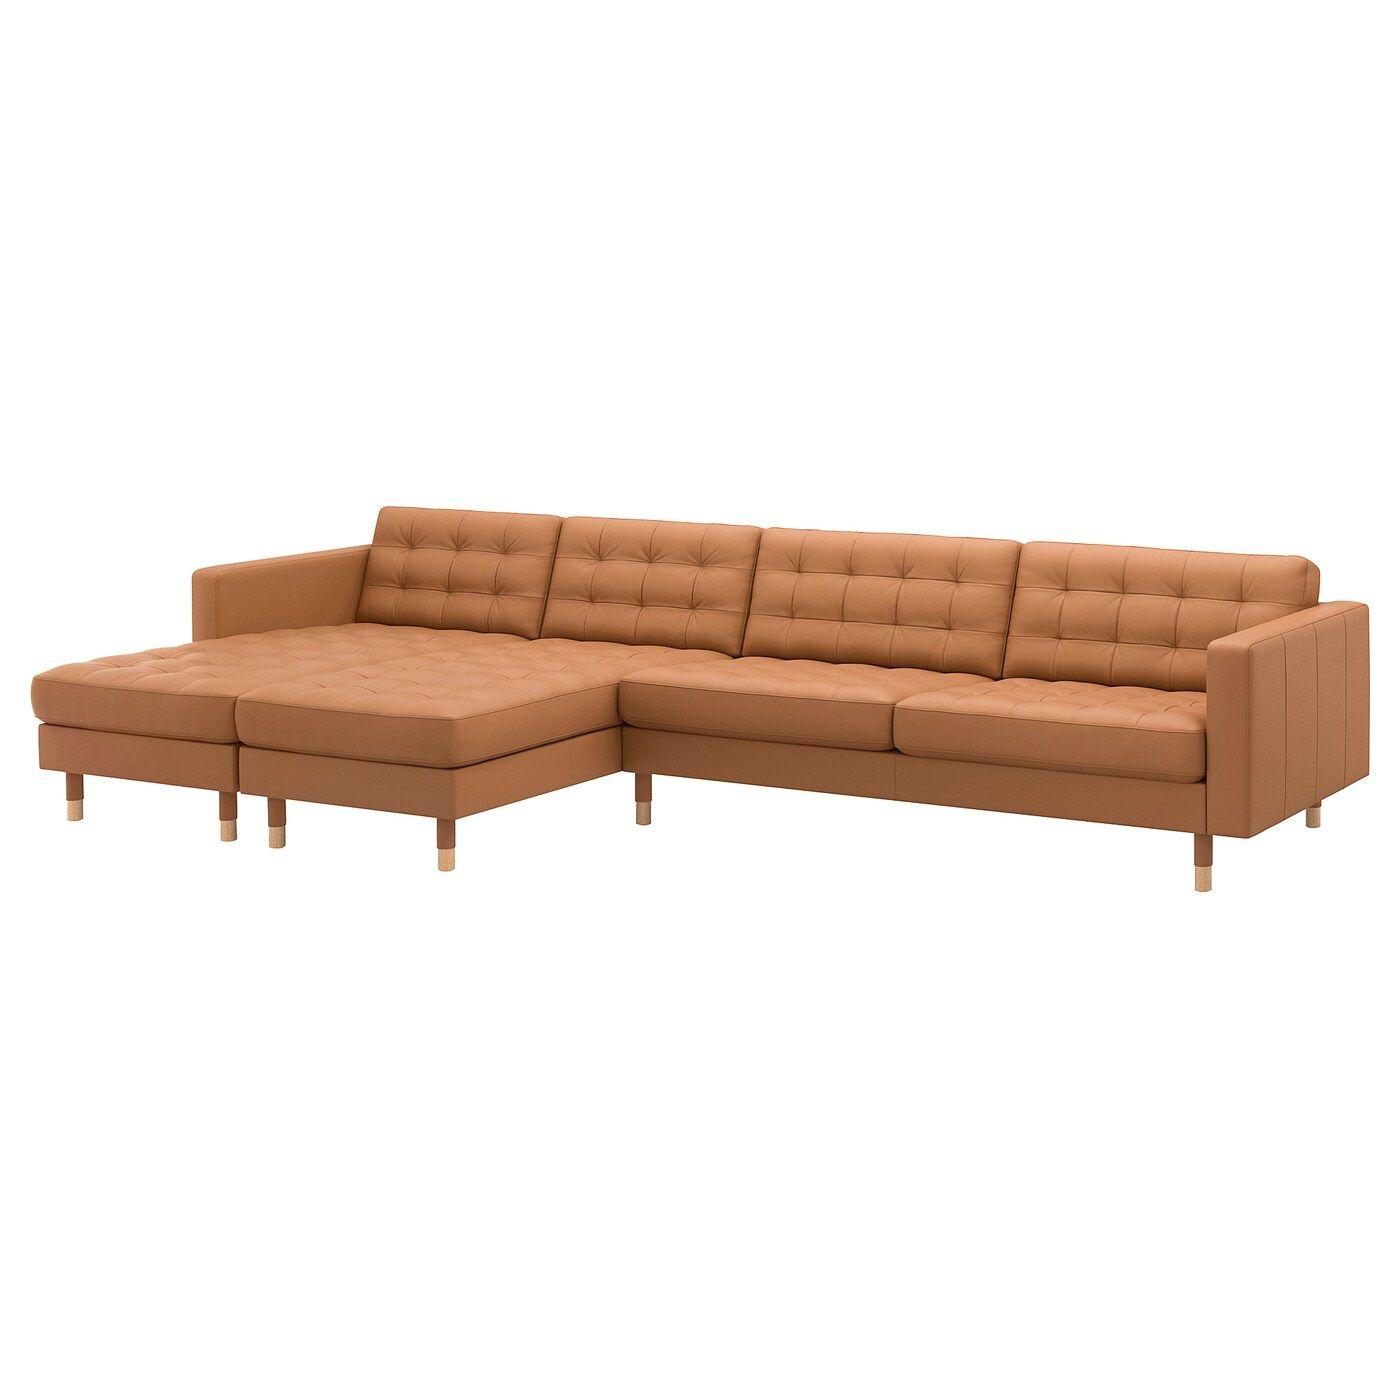 Landskrona IKEA Leather coated Fabric Corner Sofas,   KF   Sofa ...